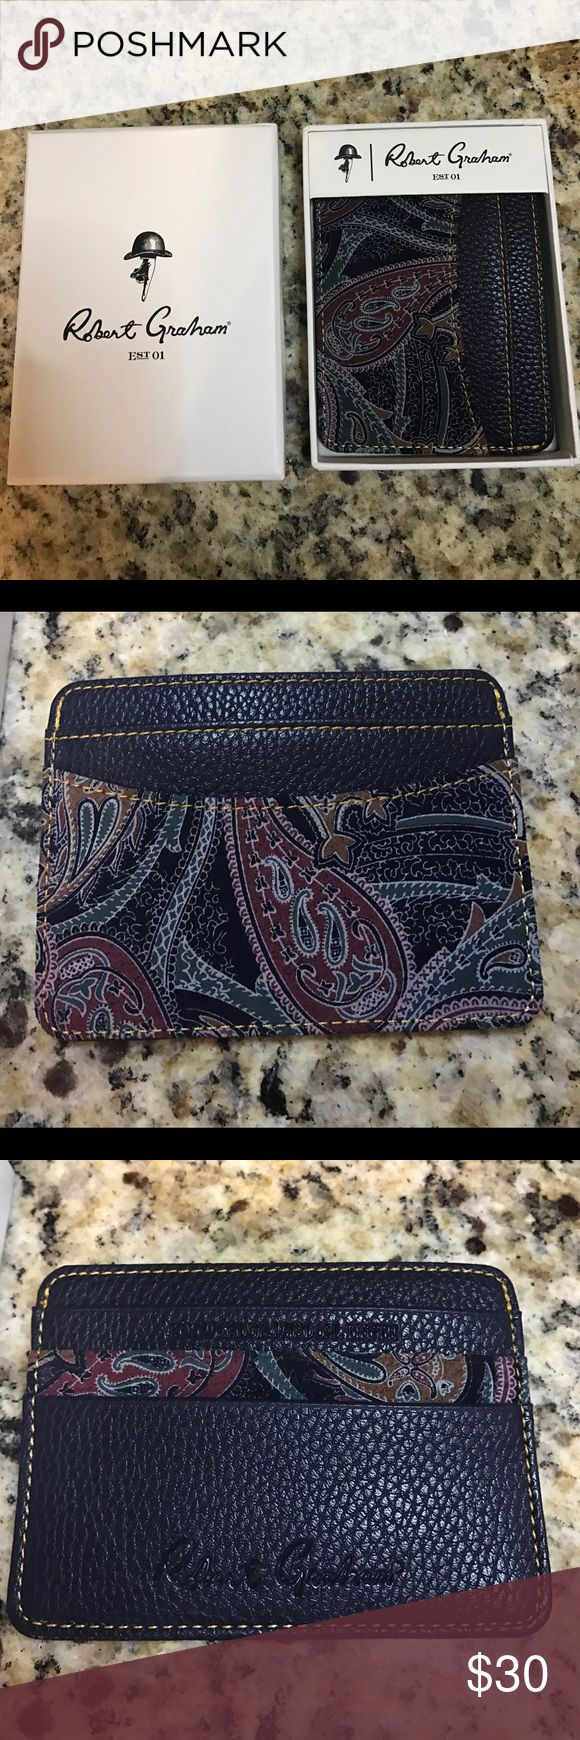 Robert Graham Wallet/ Card holder Navy blue wallet. Never used! Robert Graham Accessories Key & Card Holders